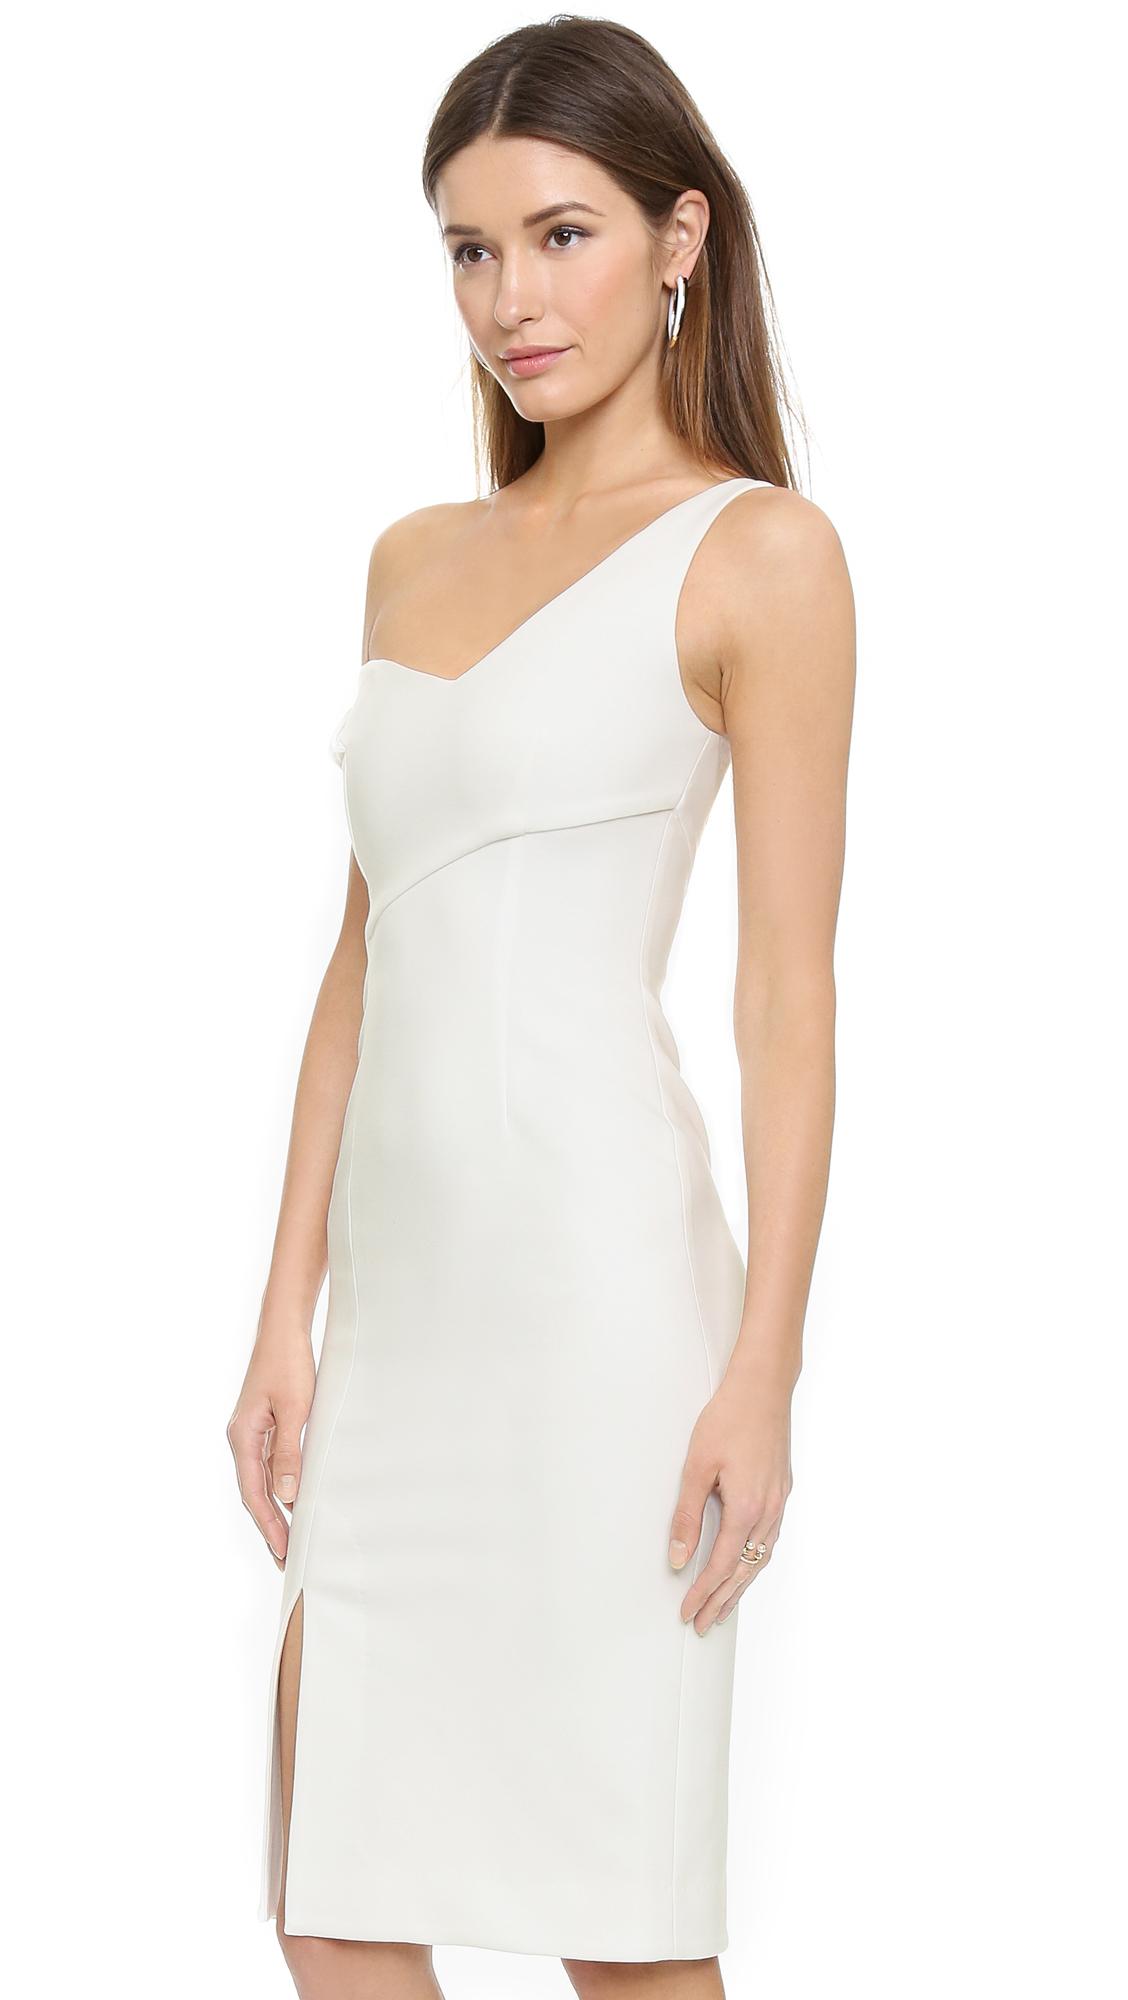 Nicholas Ponte One Shoulder Dress White In White Lyst